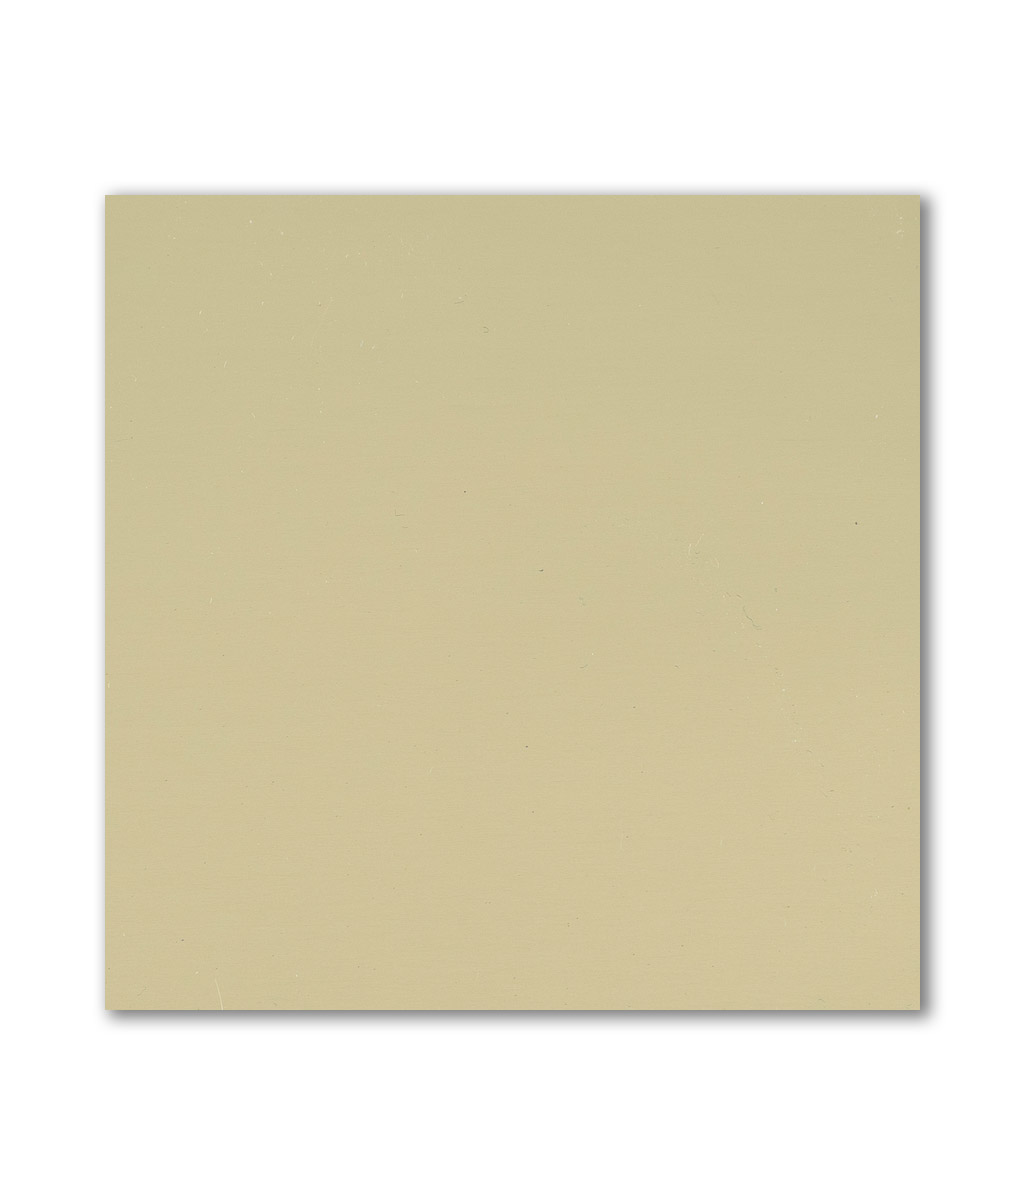 625 gold